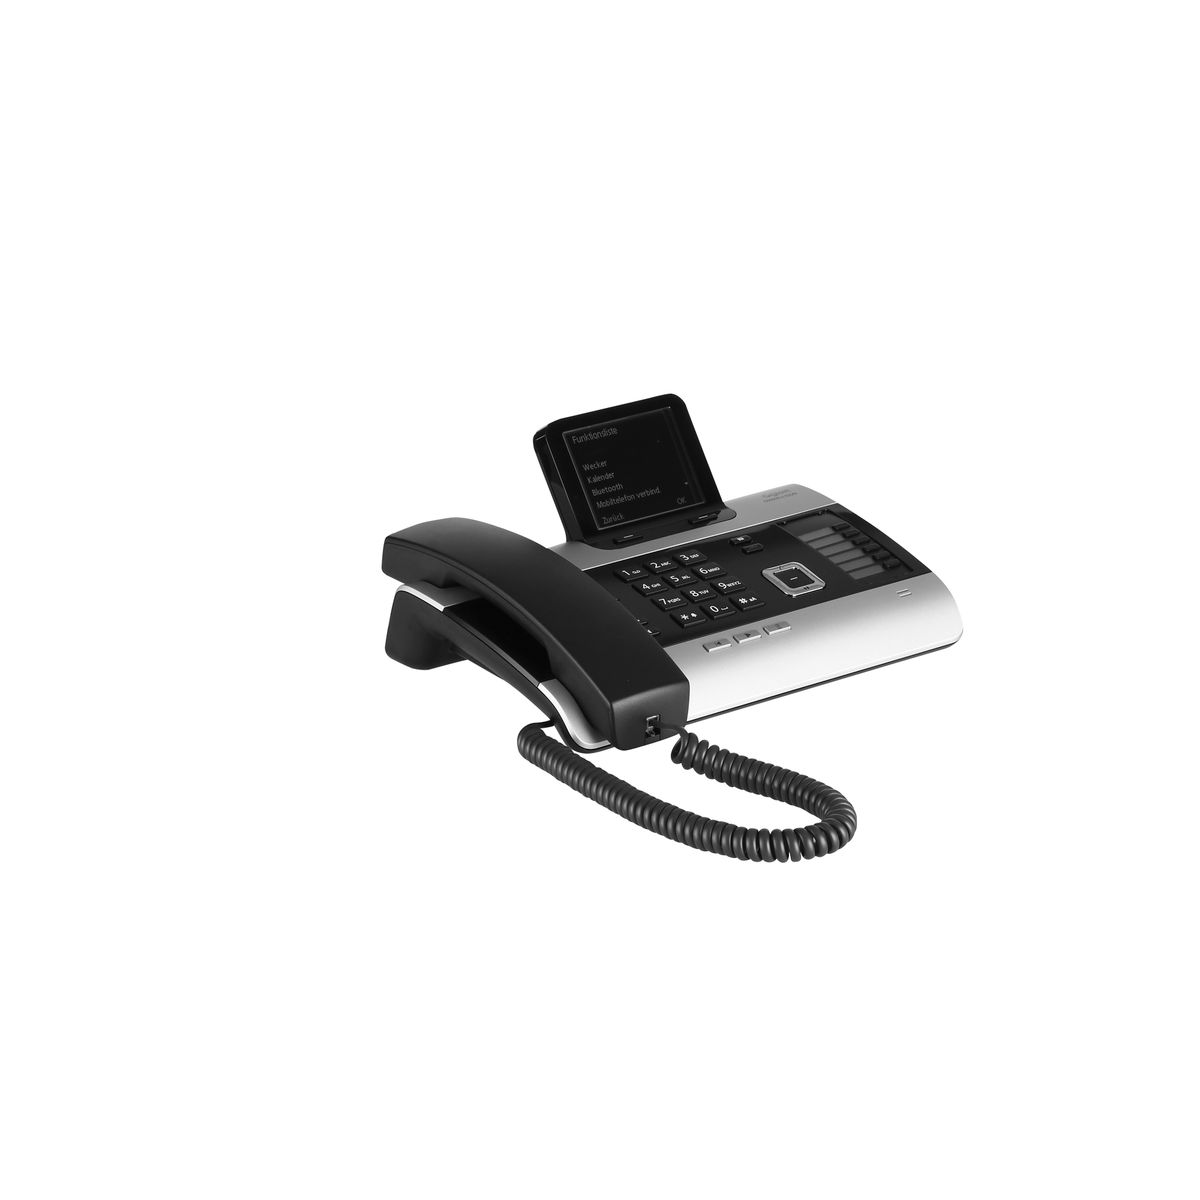 telefon siemens gigaset dx600a isdn g nstig kaufen. Black Bedroom Furniture Sets. Home Design Ideas